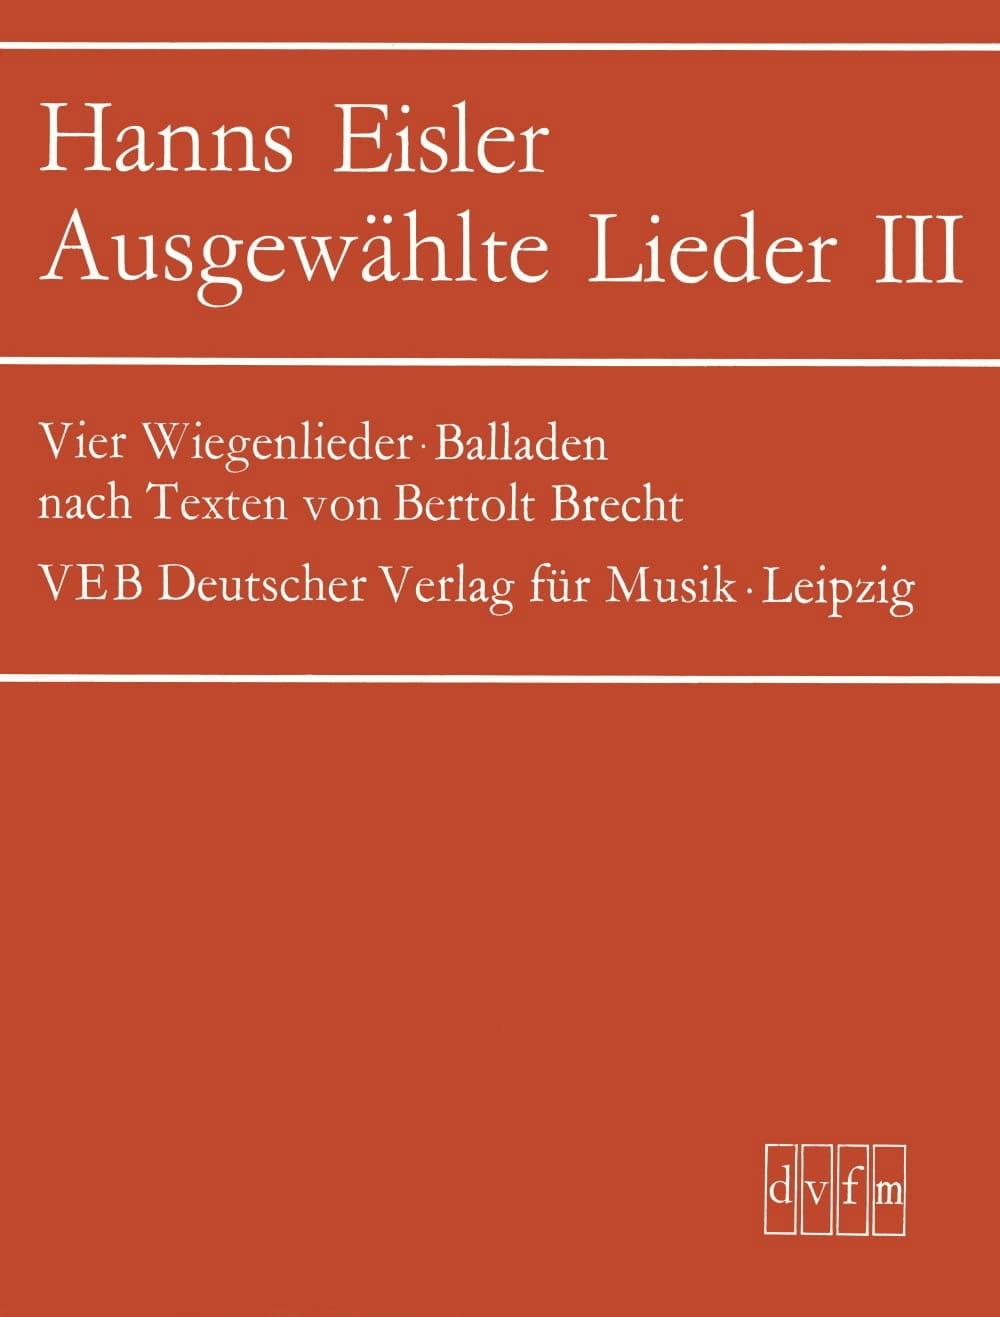 Ausgewählte Lieder 3 - Hanns Eisler - Partition - laflutedepan.com